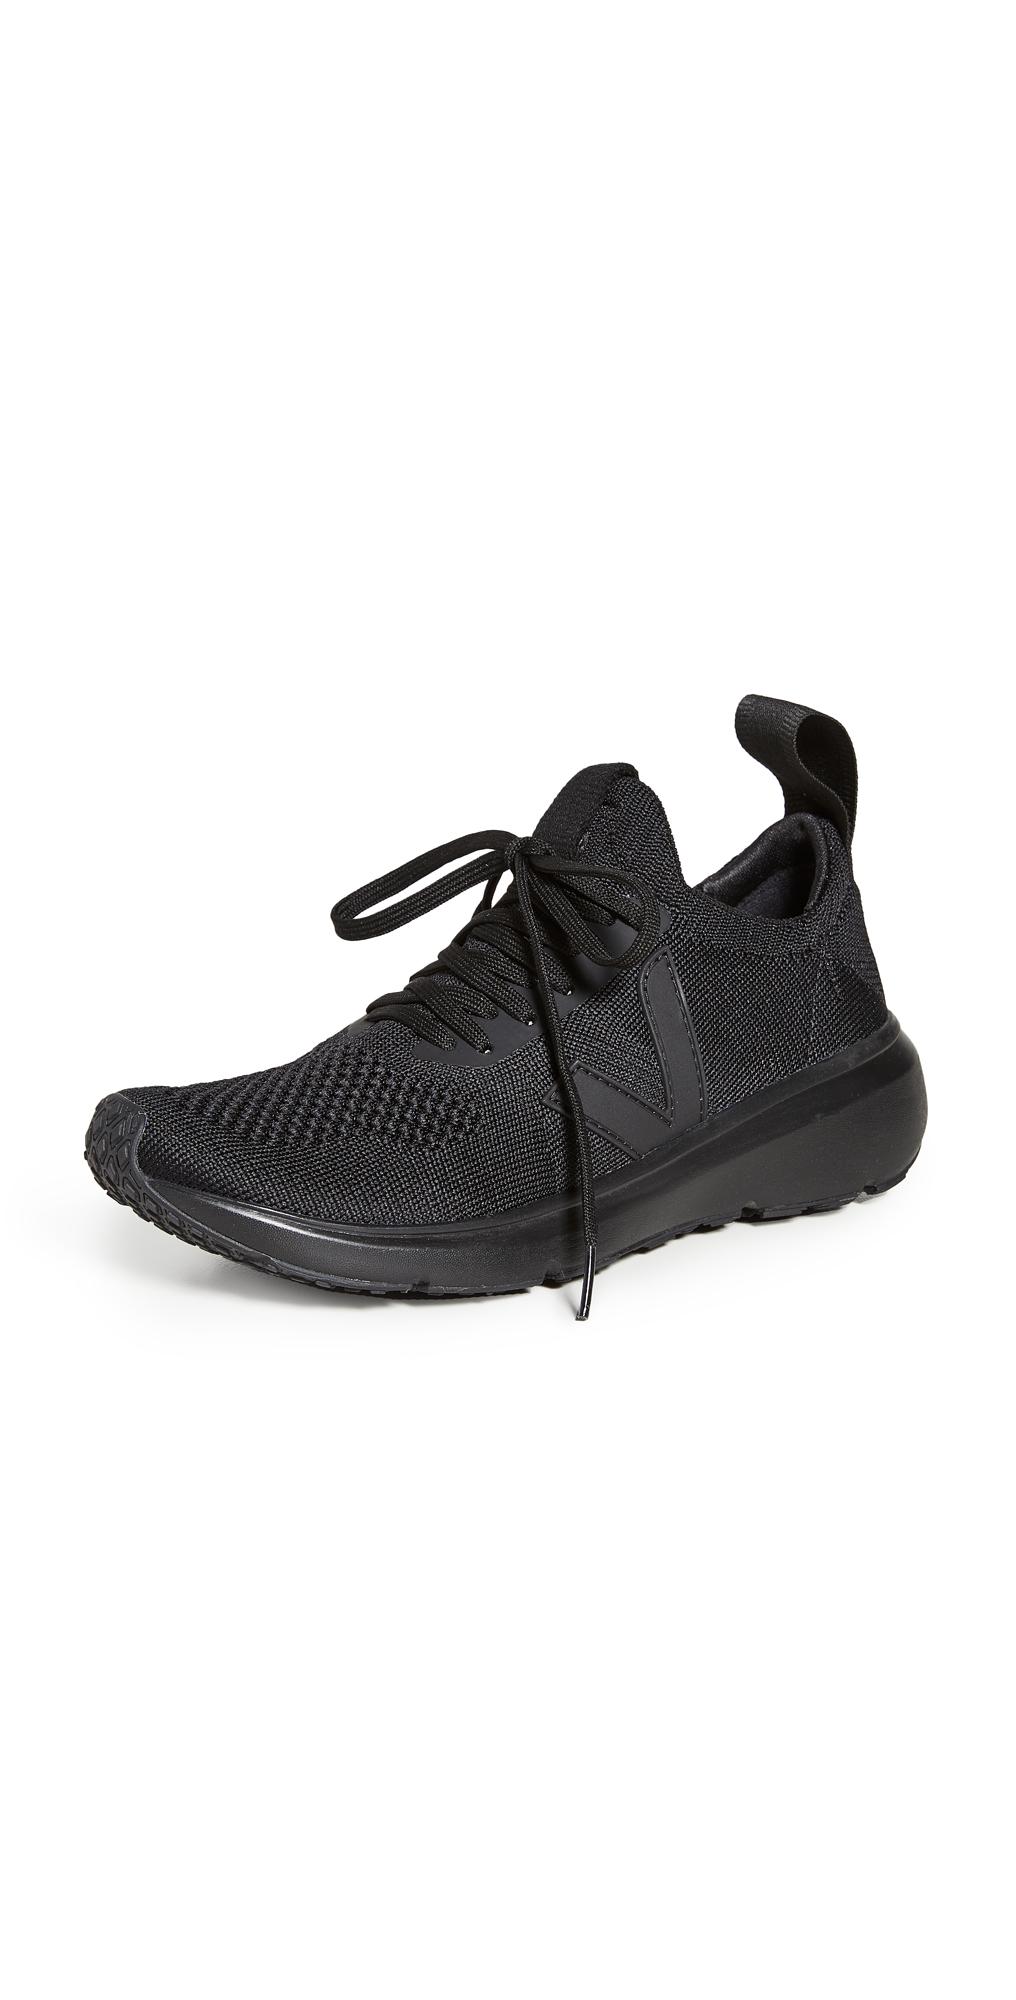 Veja x Rick Owens Running Style Sneakers